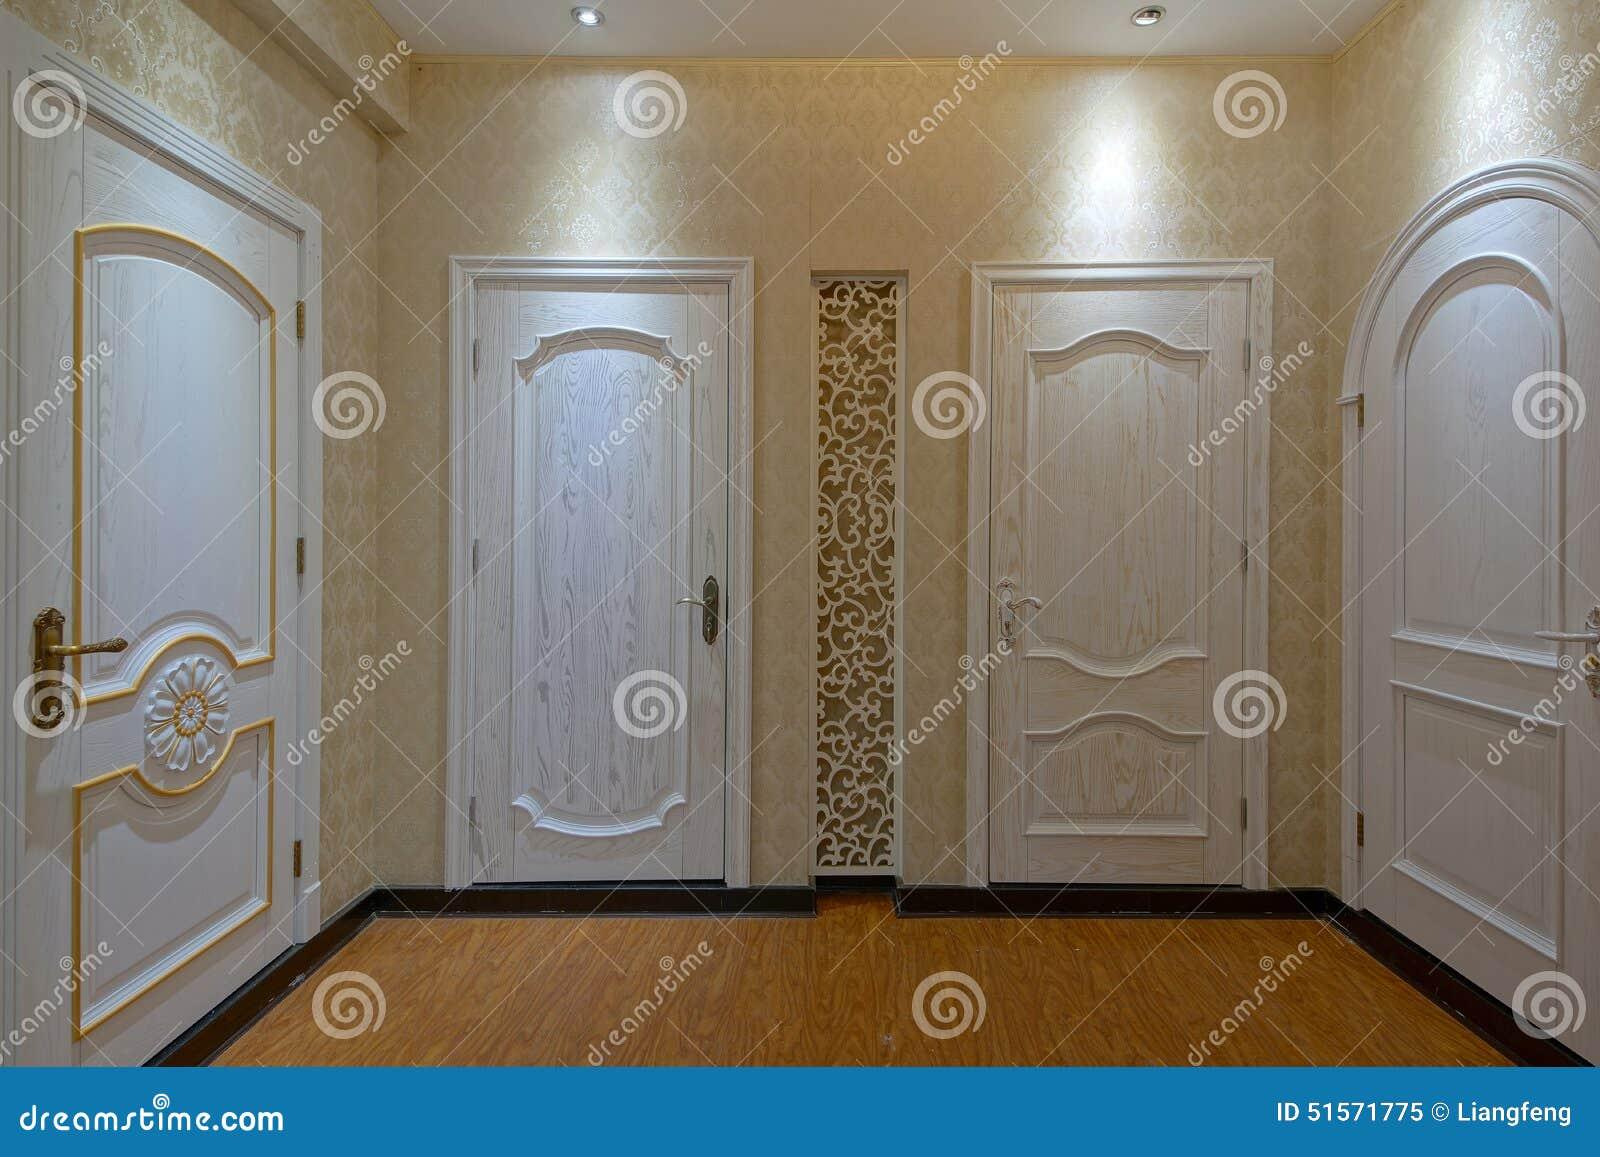 957 #82A328 Modern Family Illuminative Beautiful Wooden Door. image Beautiful Wooden Doors 46731300